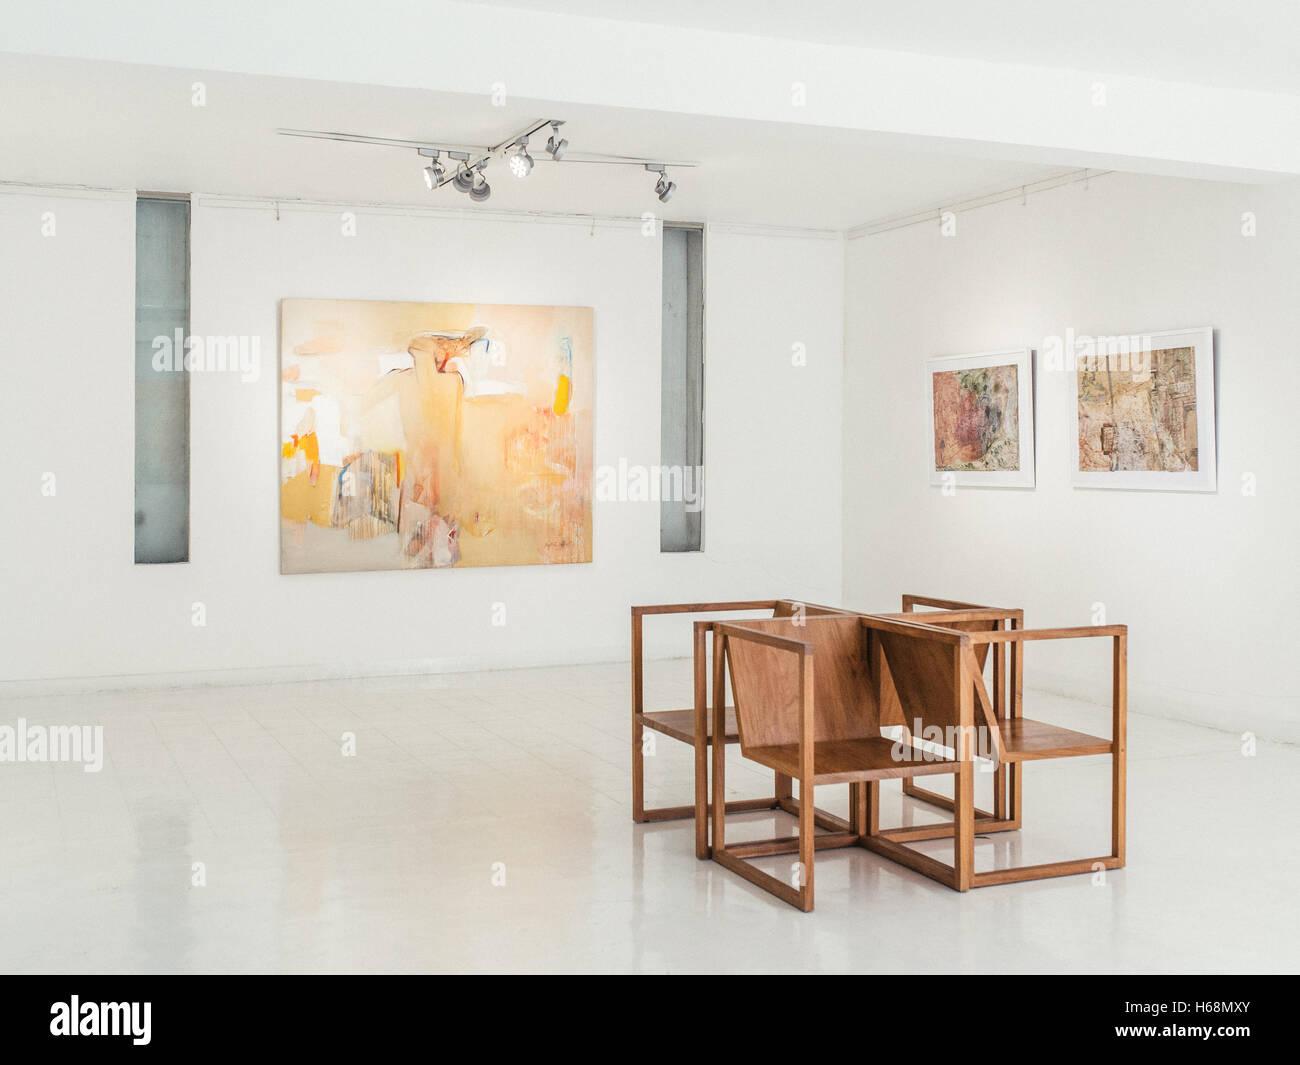 colombo sri lanka june 10th 2016 saskia fernando art gallery in